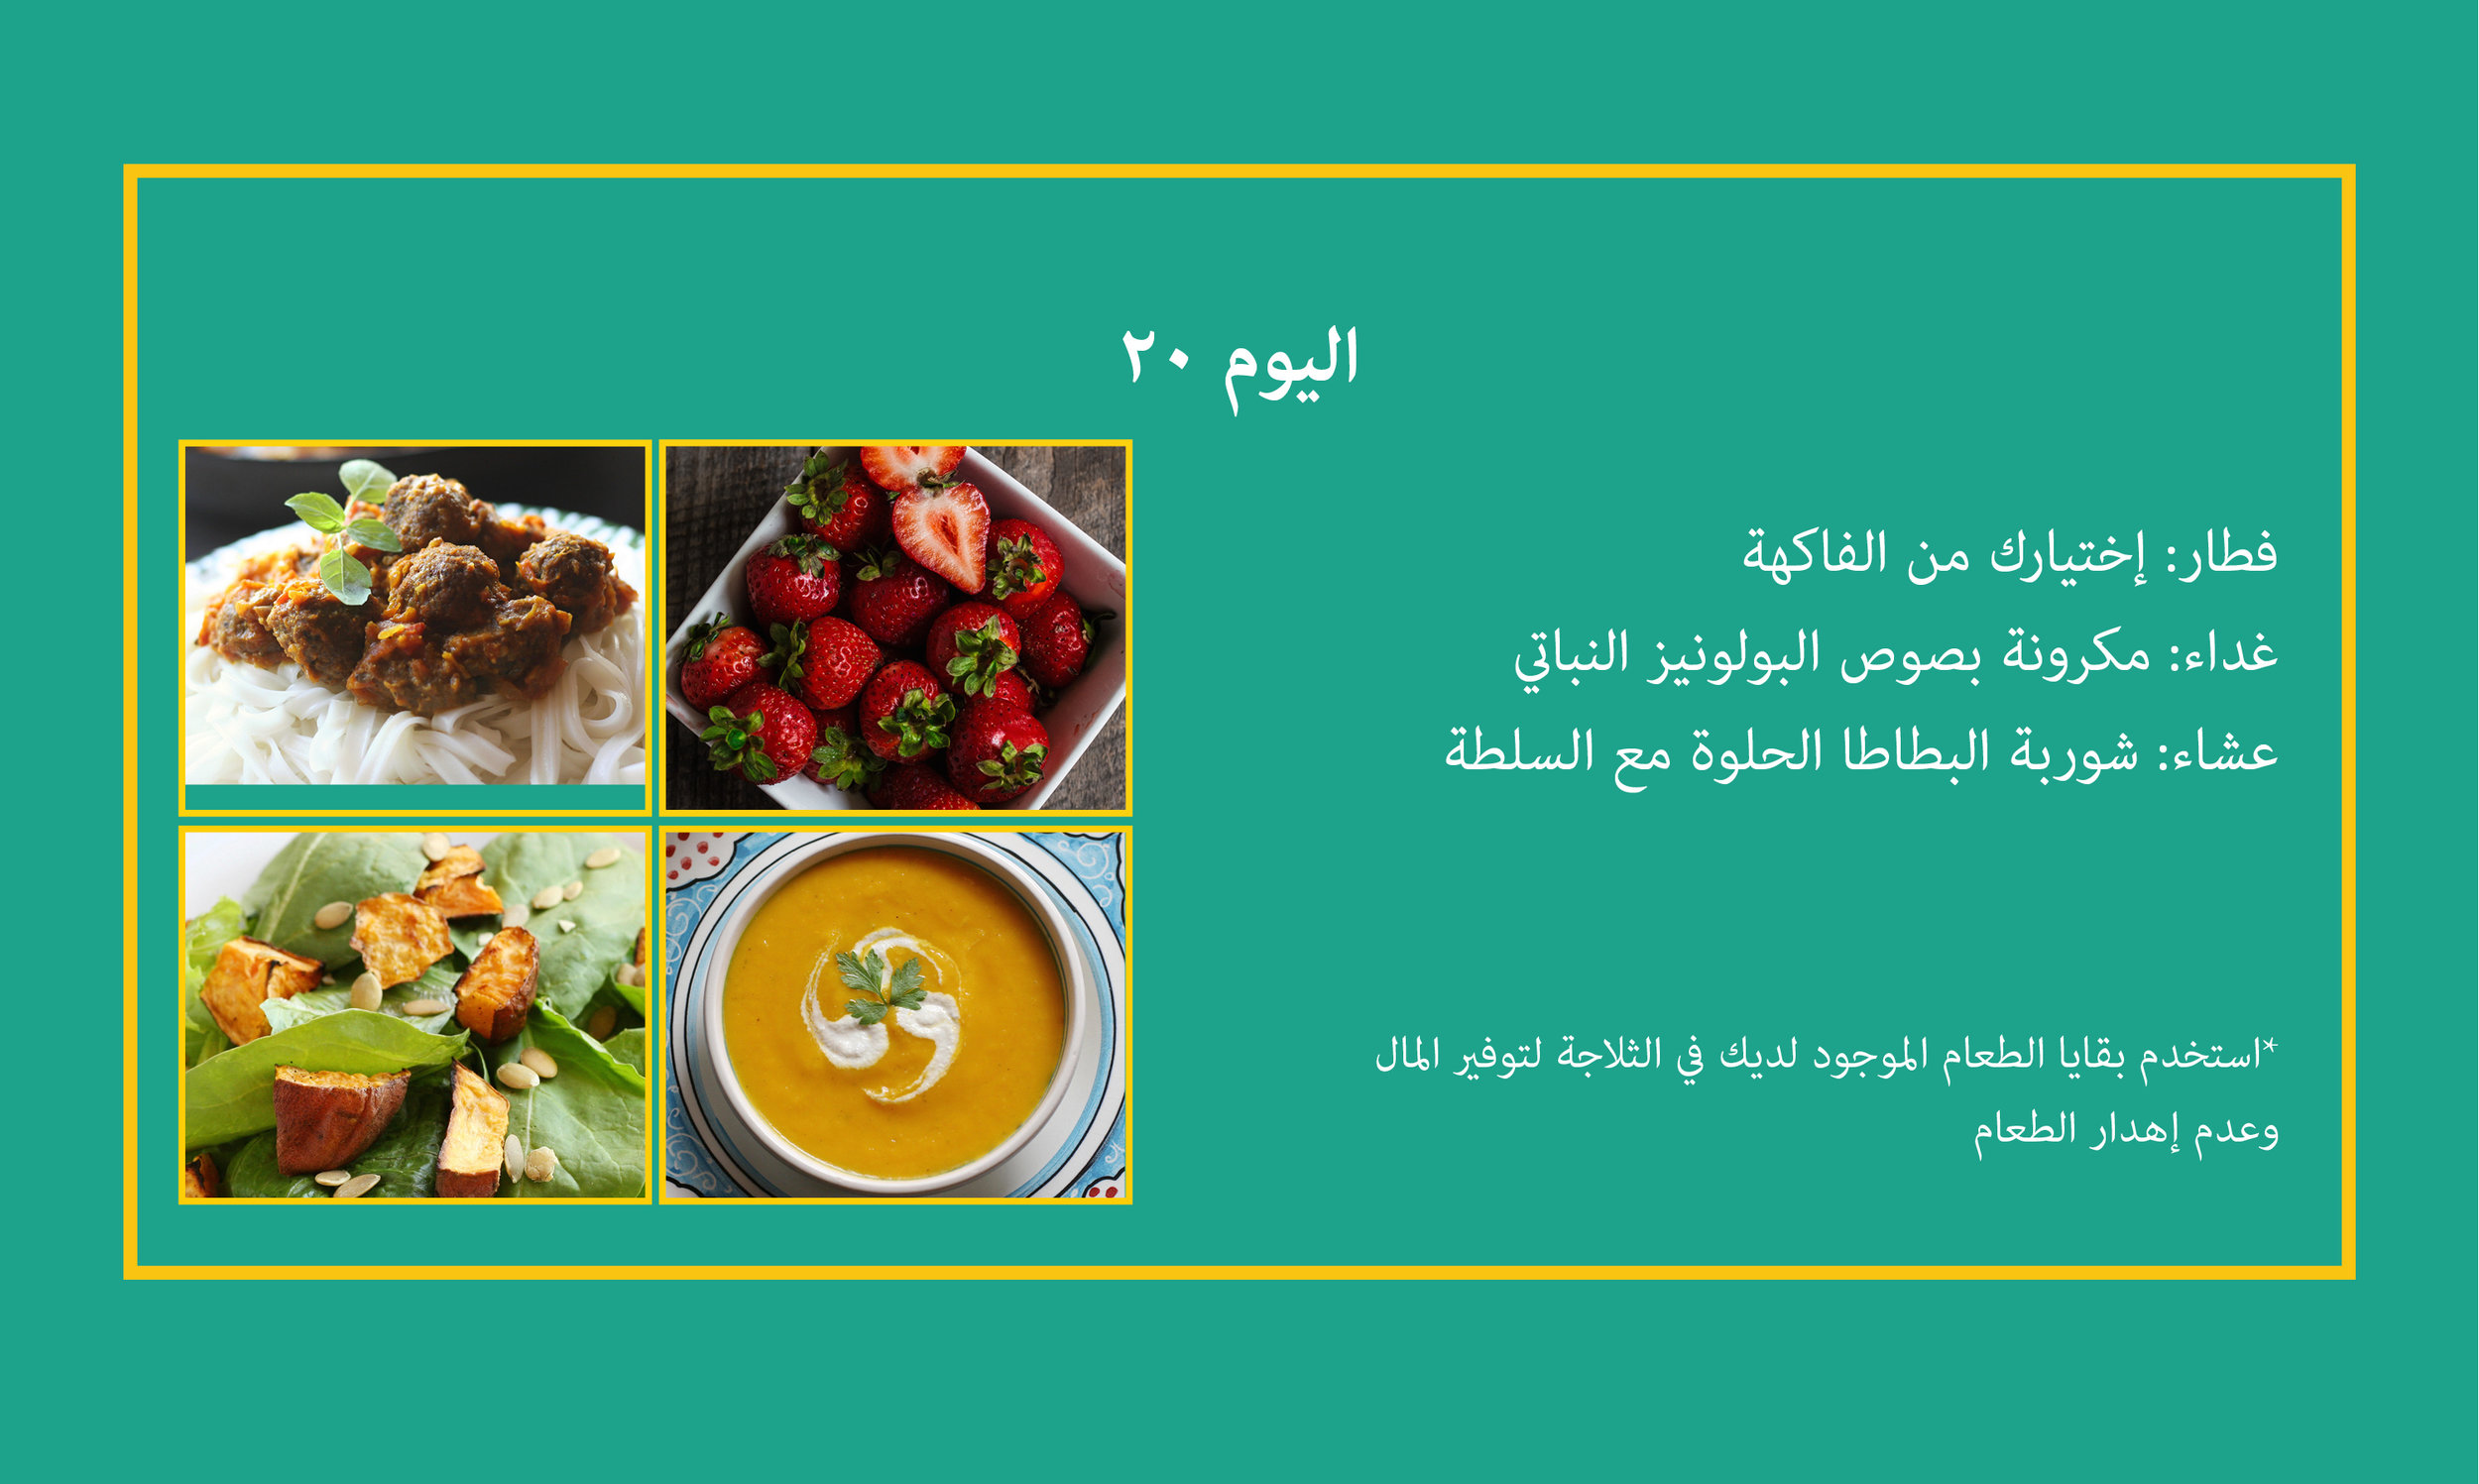 Day 20 Arabic.jpg